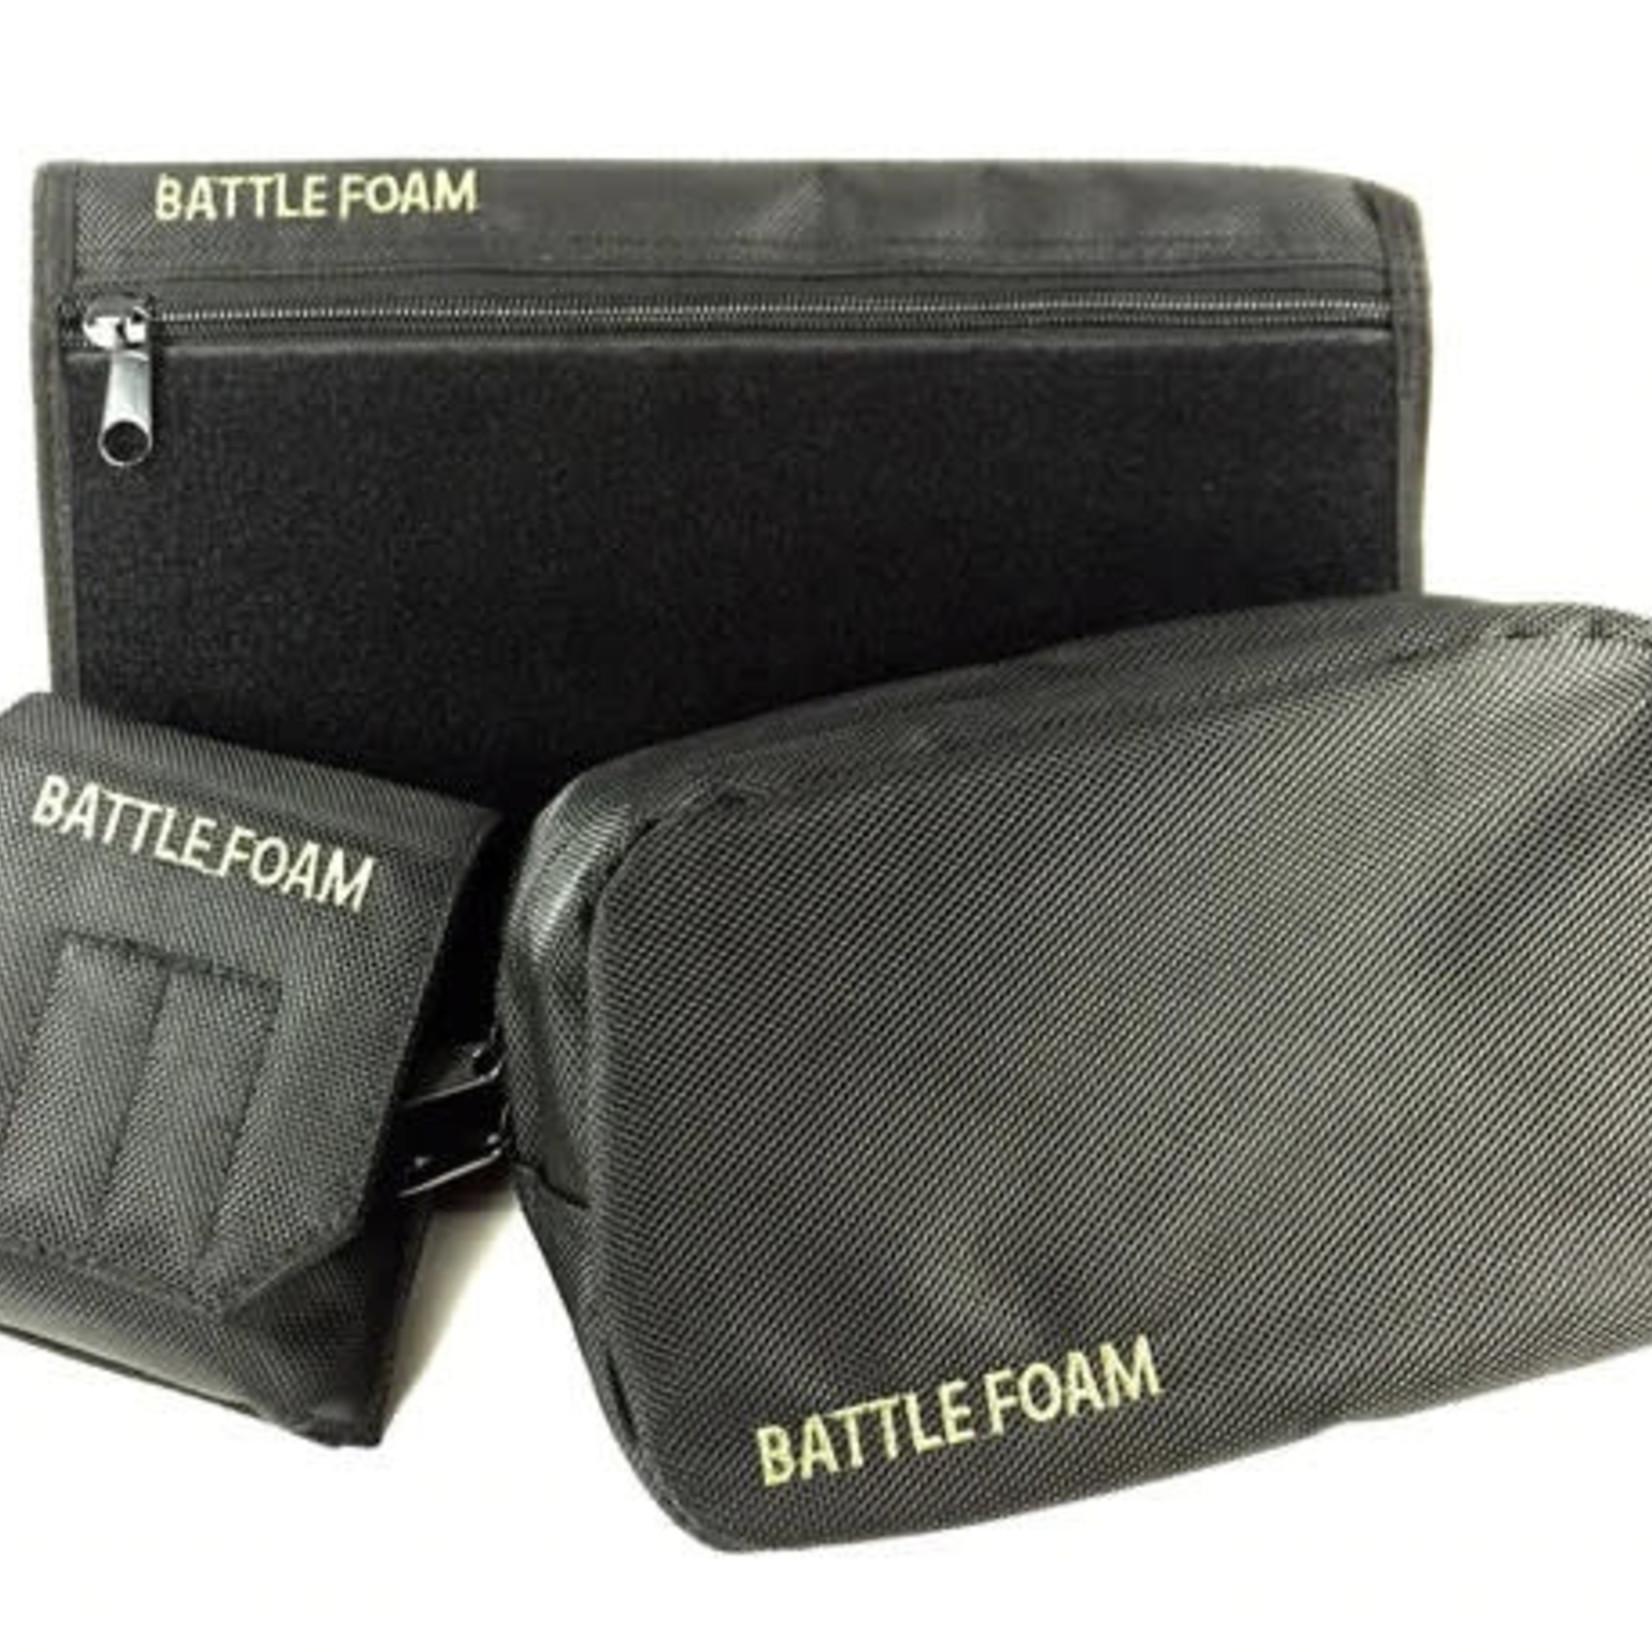 Battlefoam Grenade Ditty Media Molle Accessory Pack (Black)